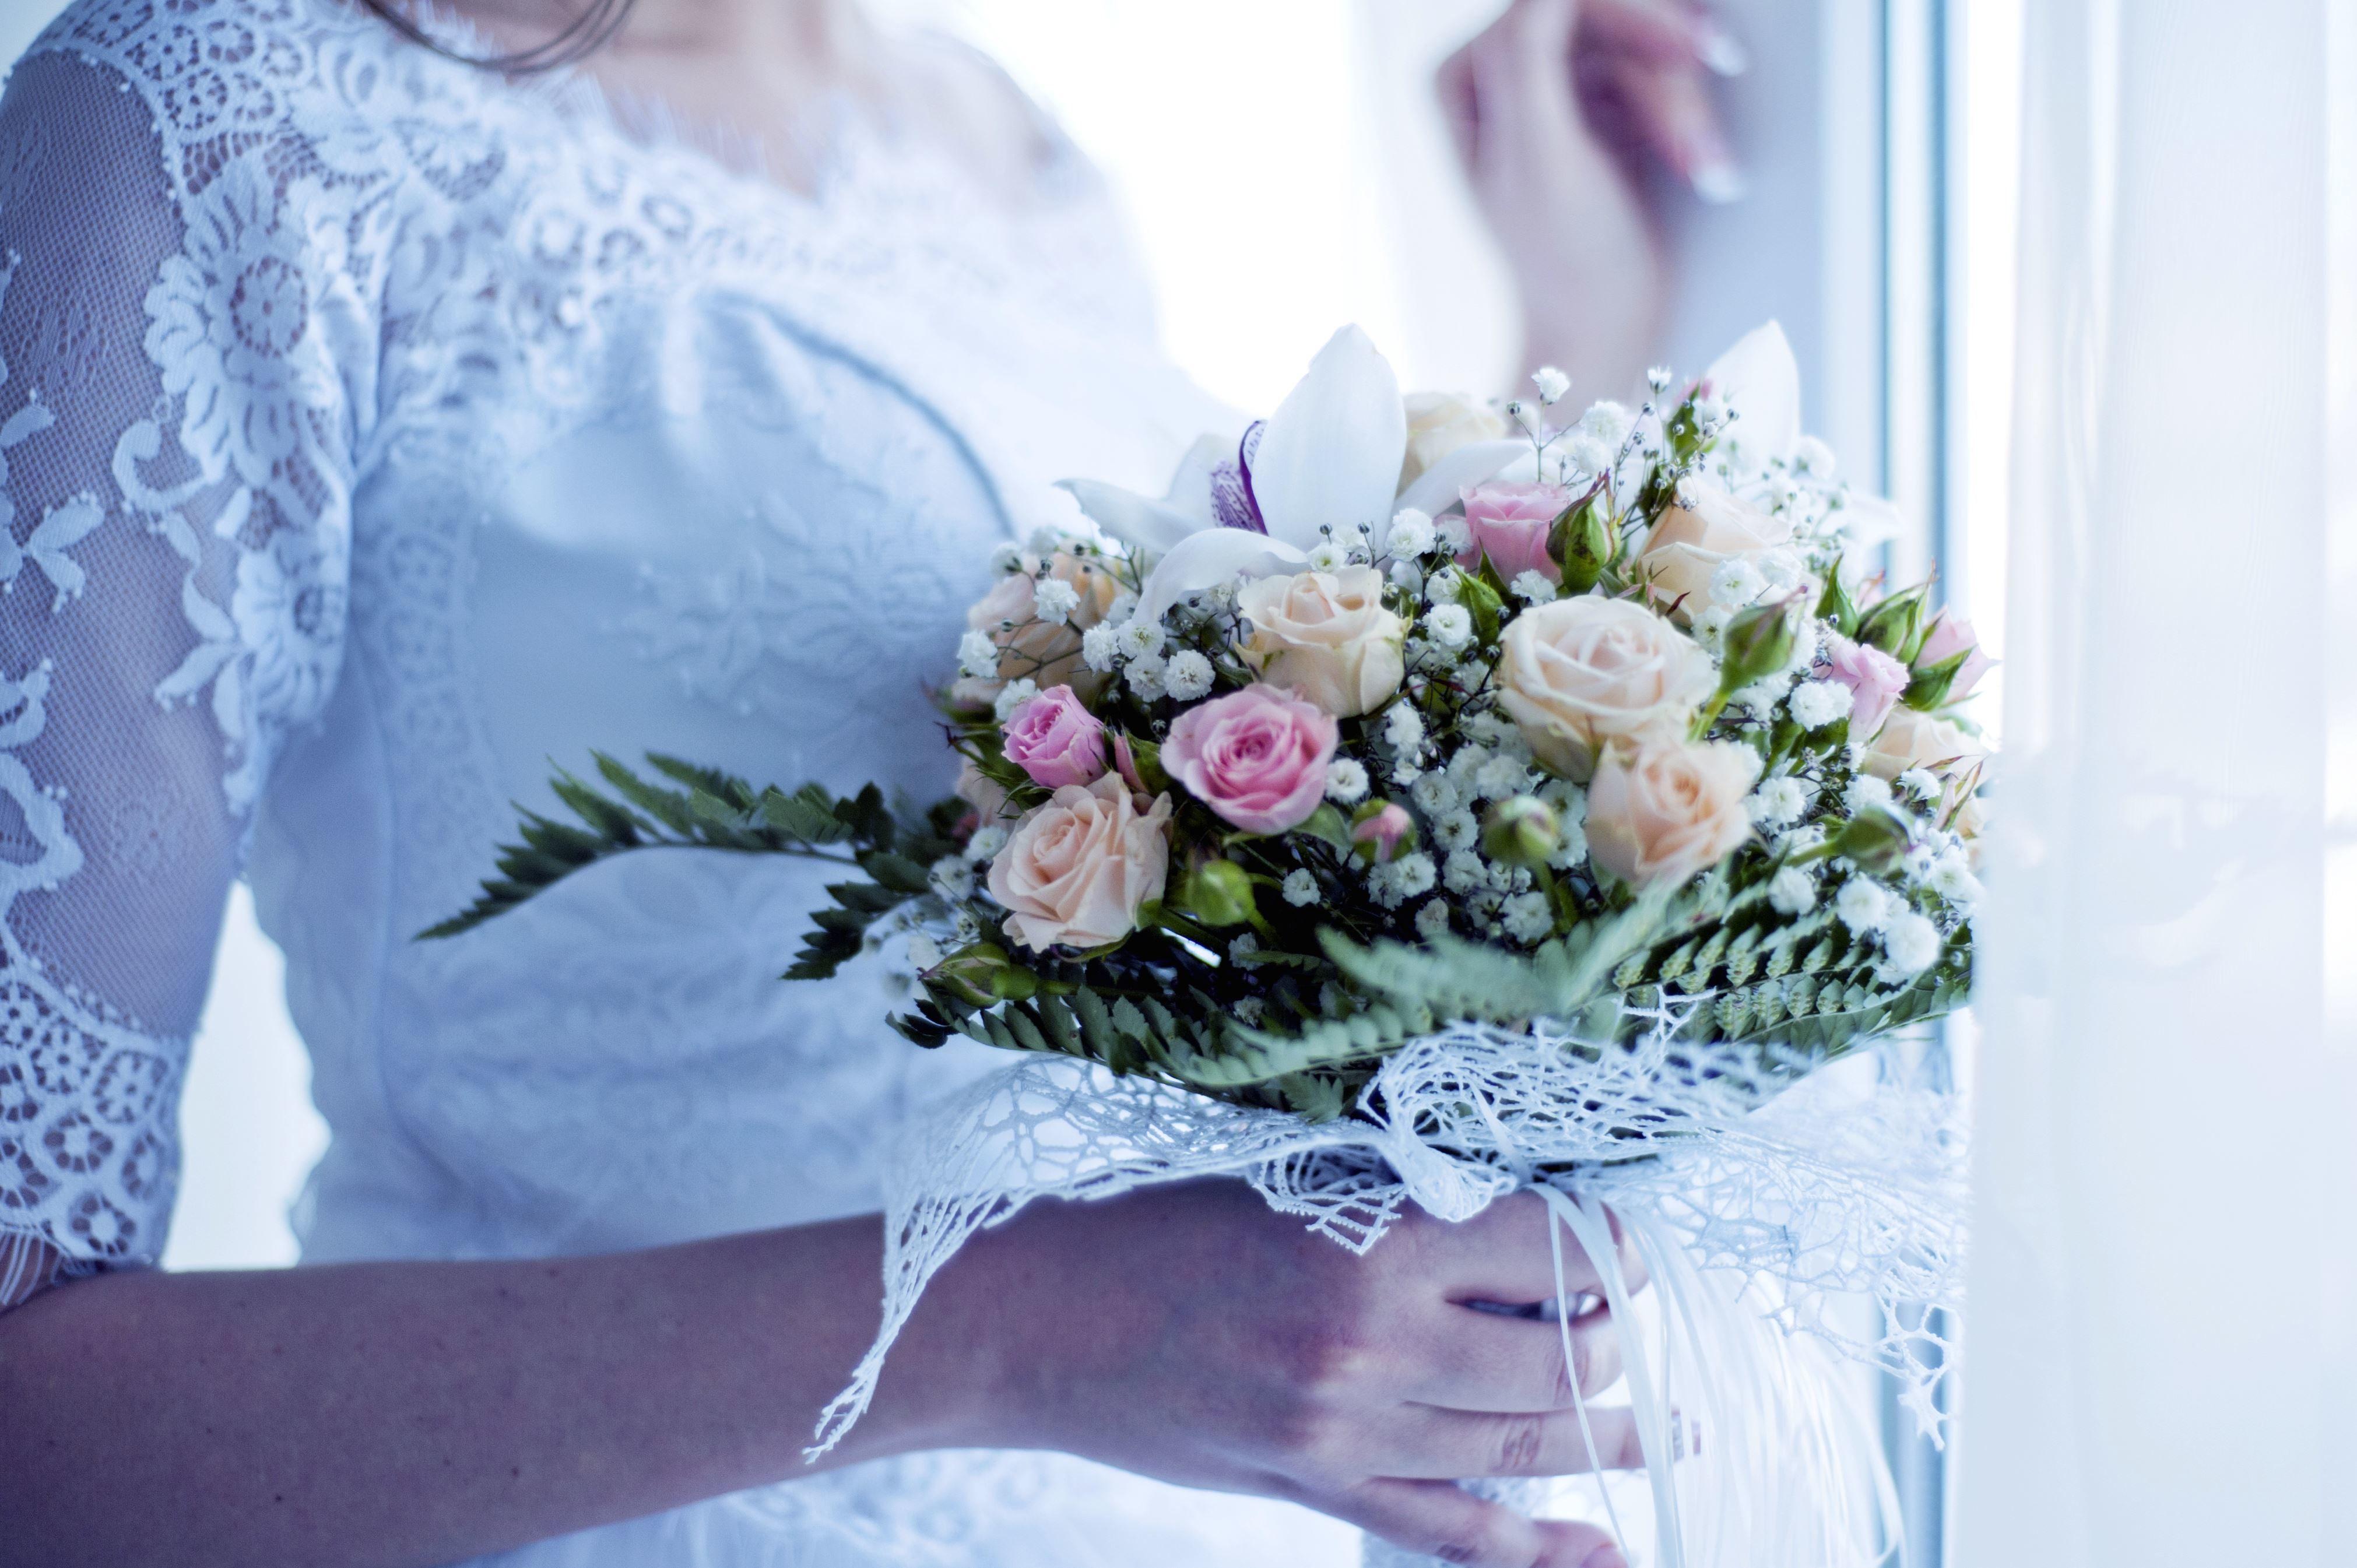 Free picture: bride, wedding dress, beautiful, blooming flowers, woman